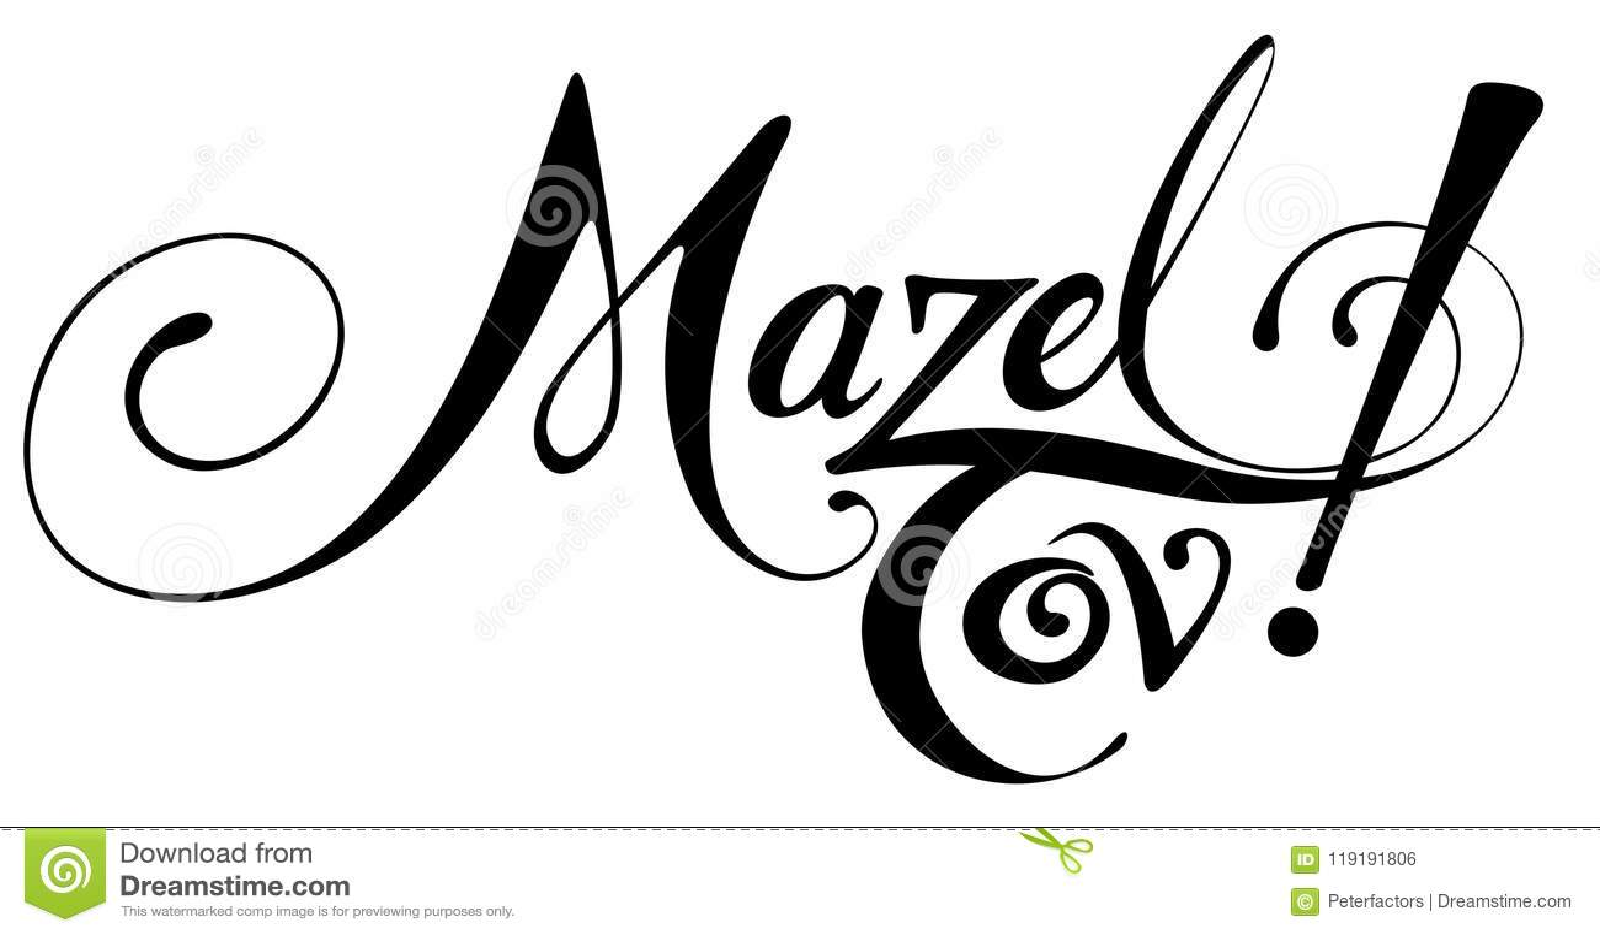 Tov Mazel!